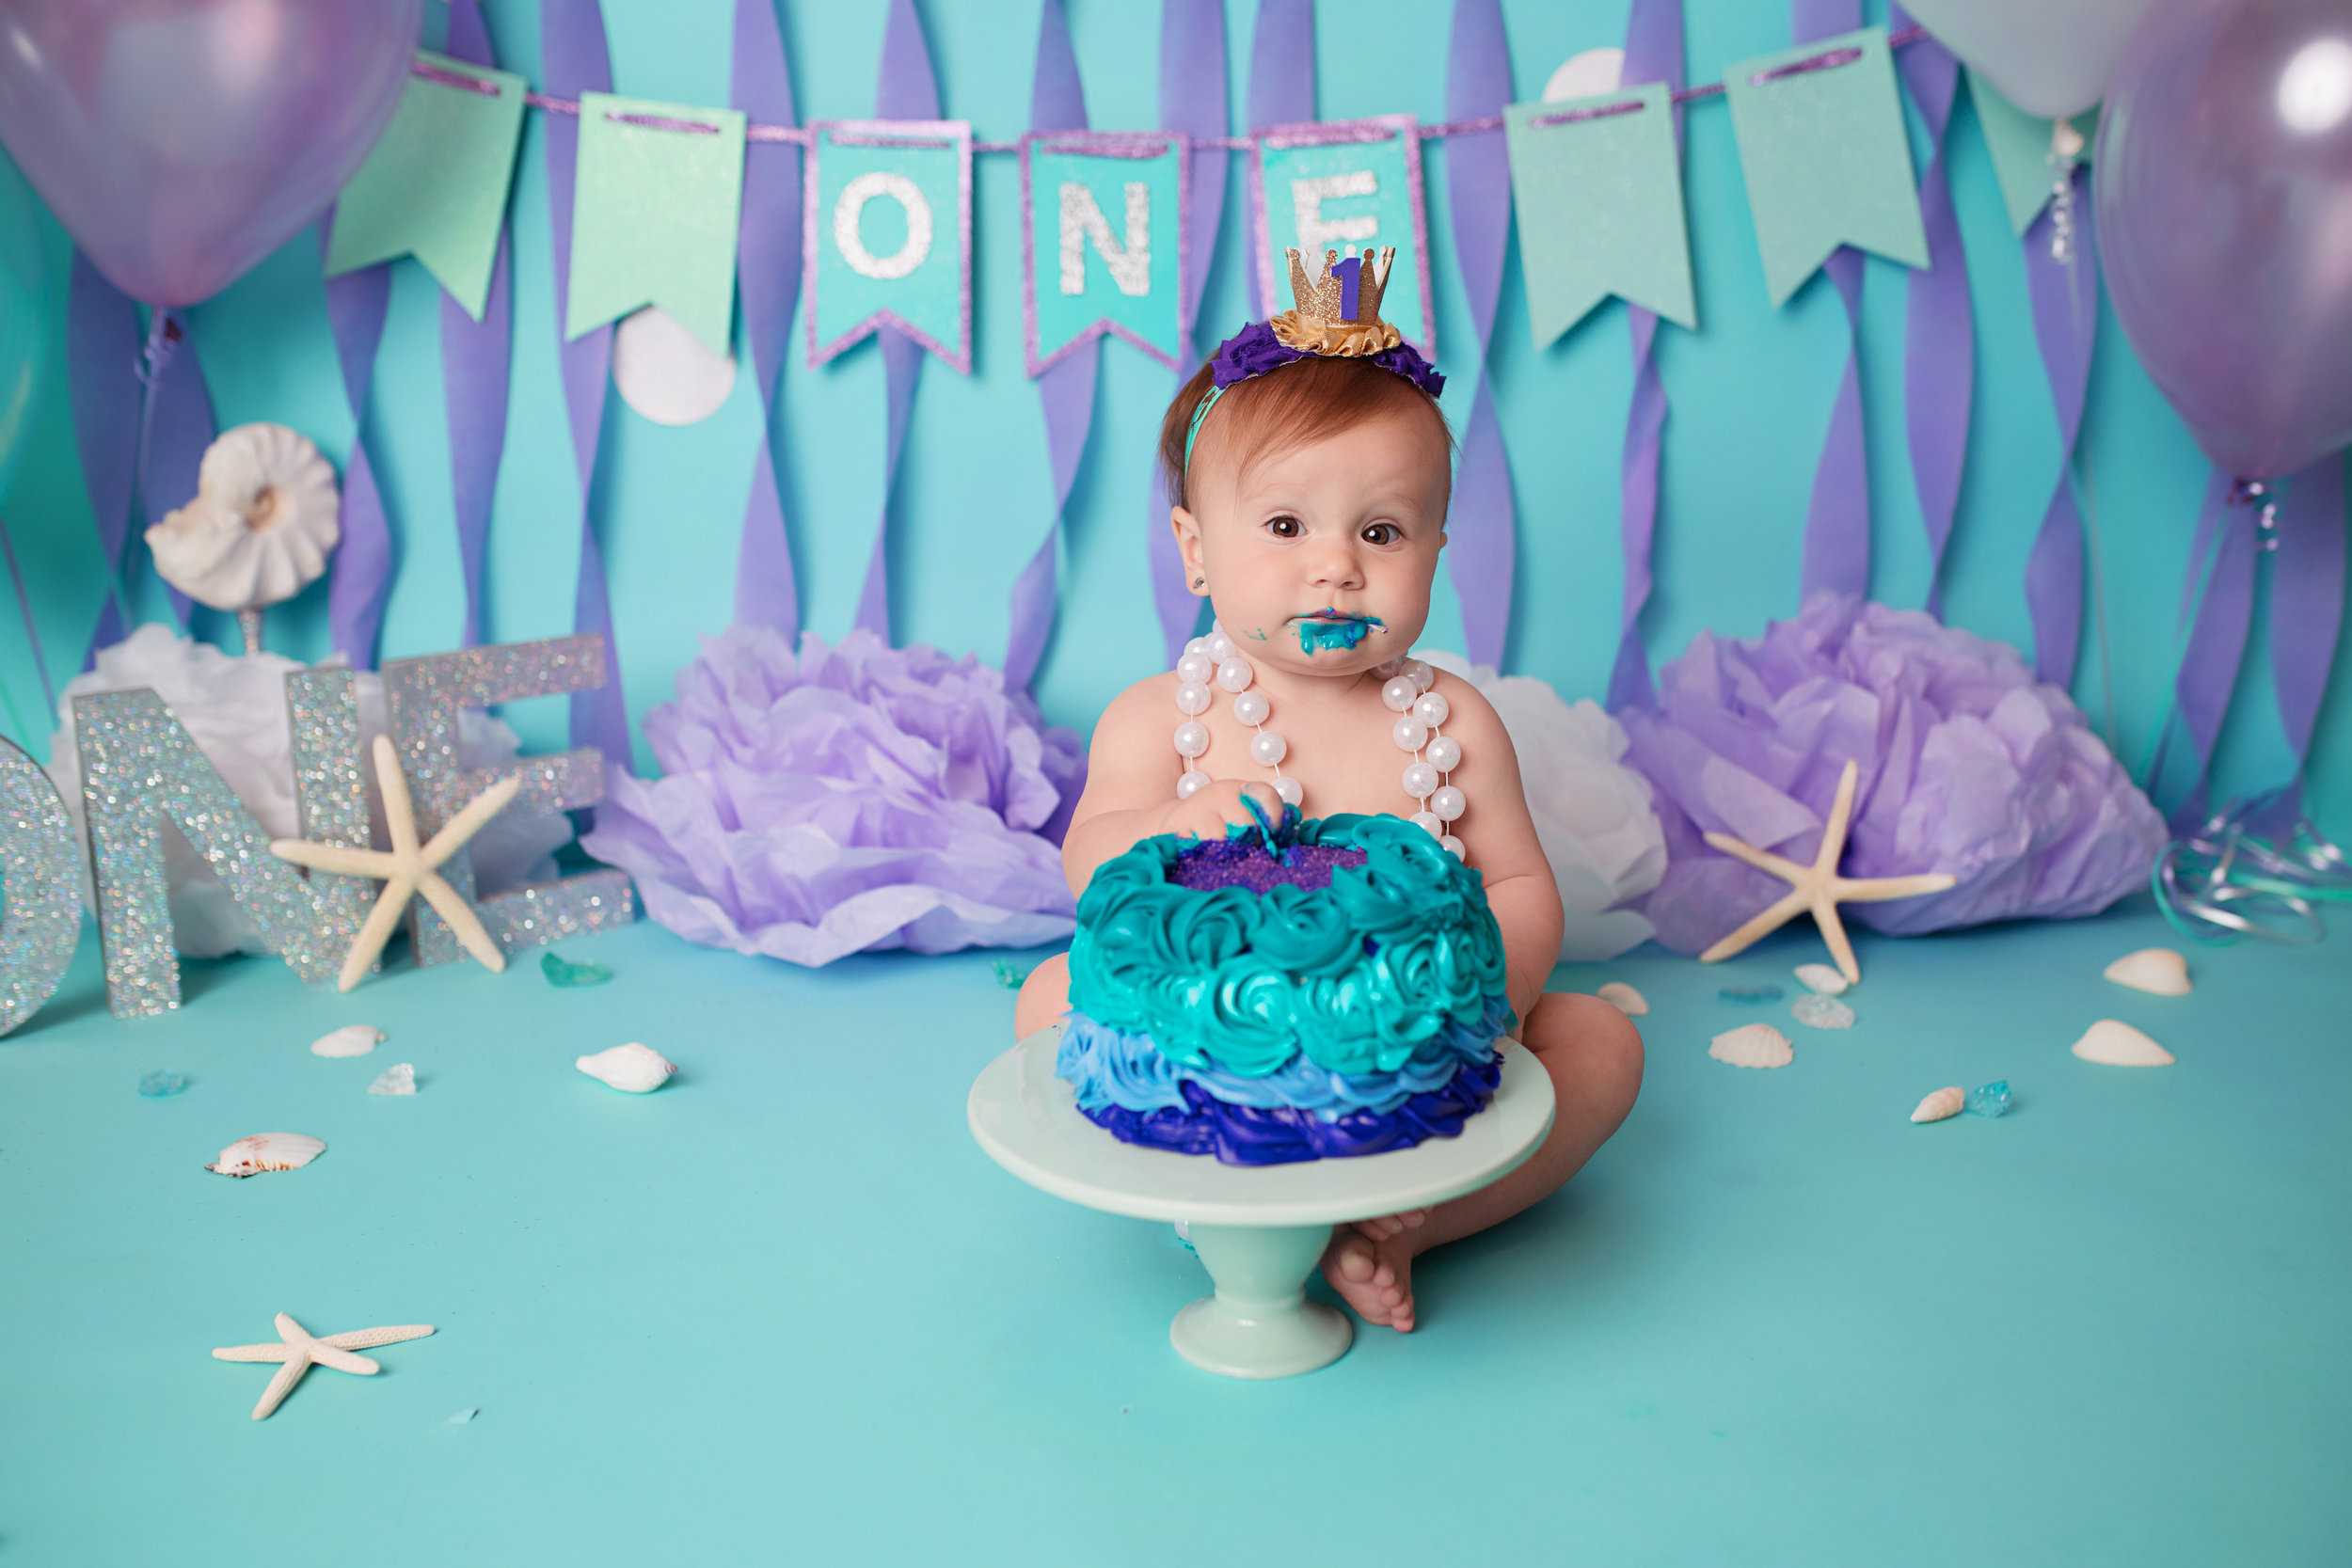 anchorage-cake-smash-photography-1.jpg